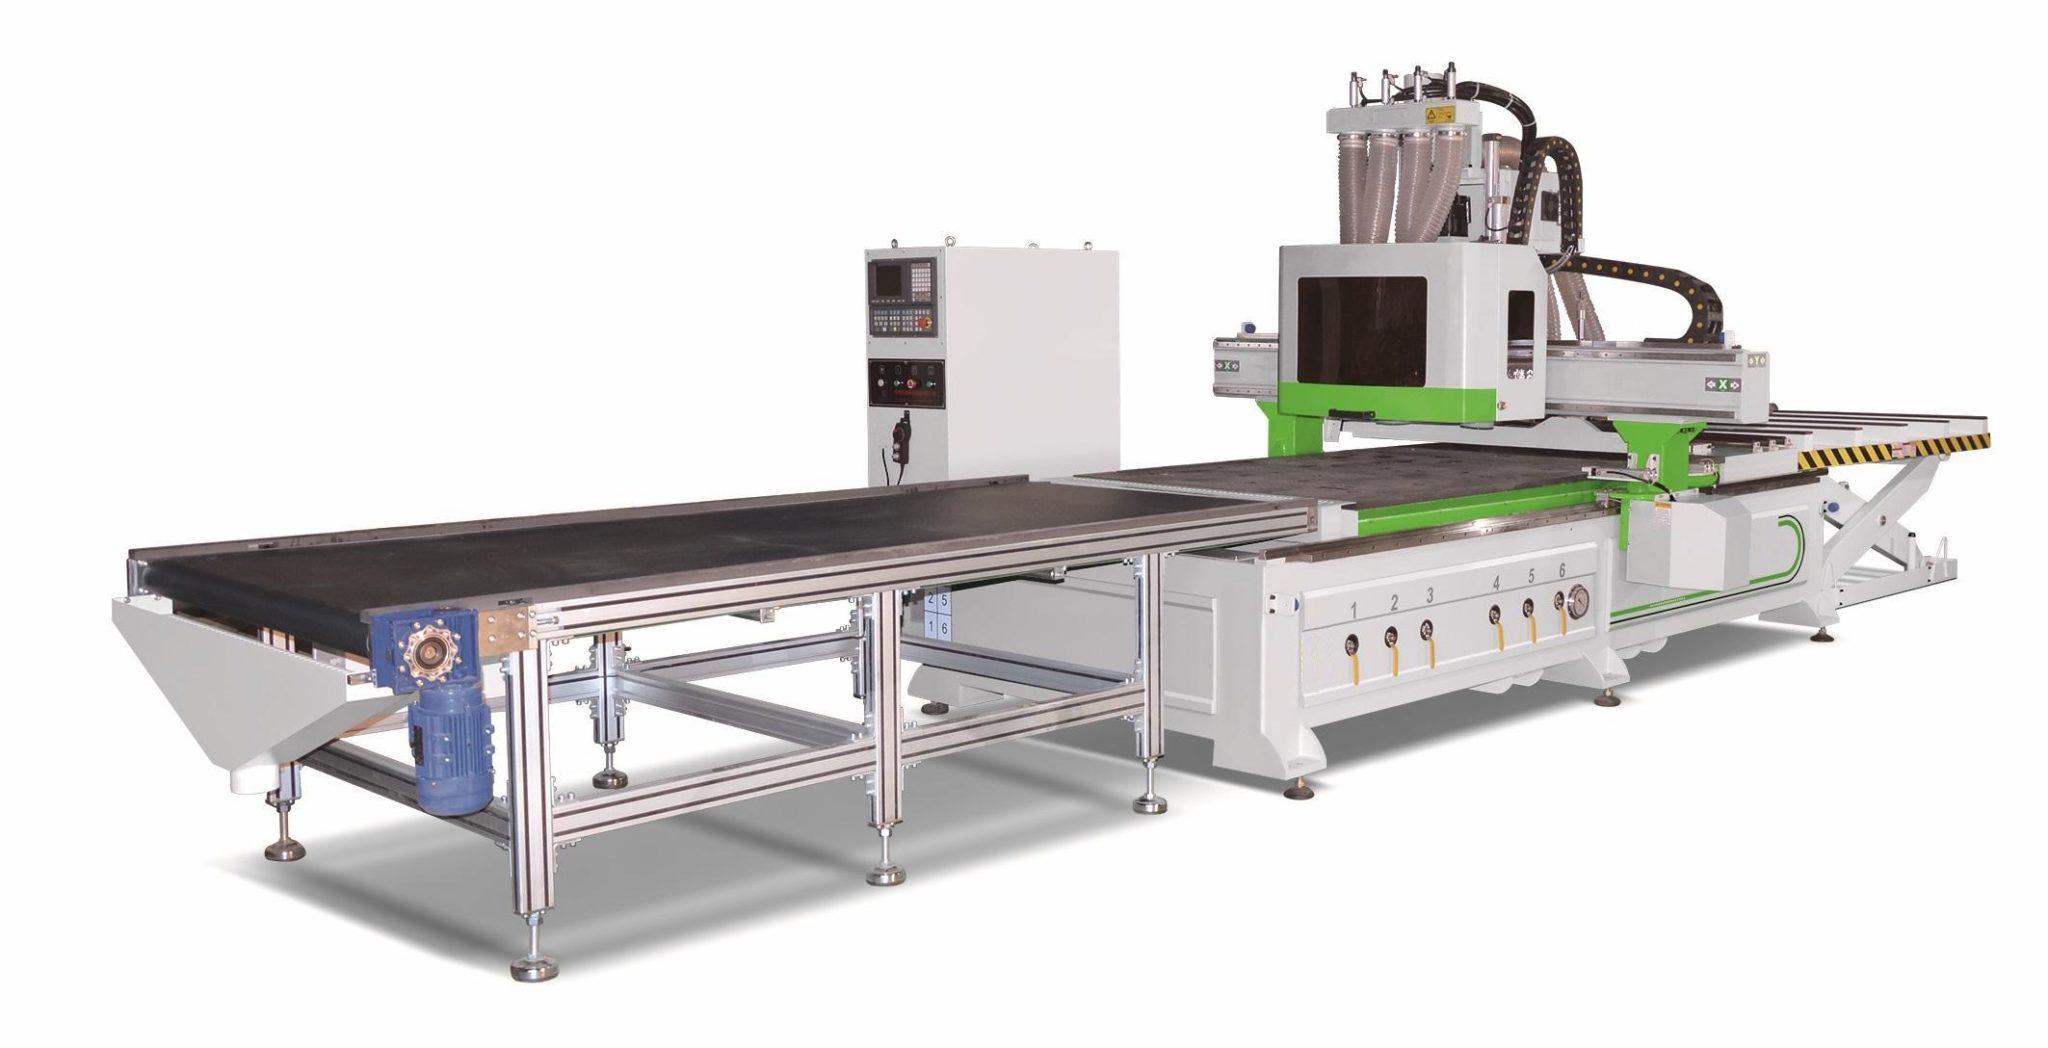 Pro 510 Full Line CNC